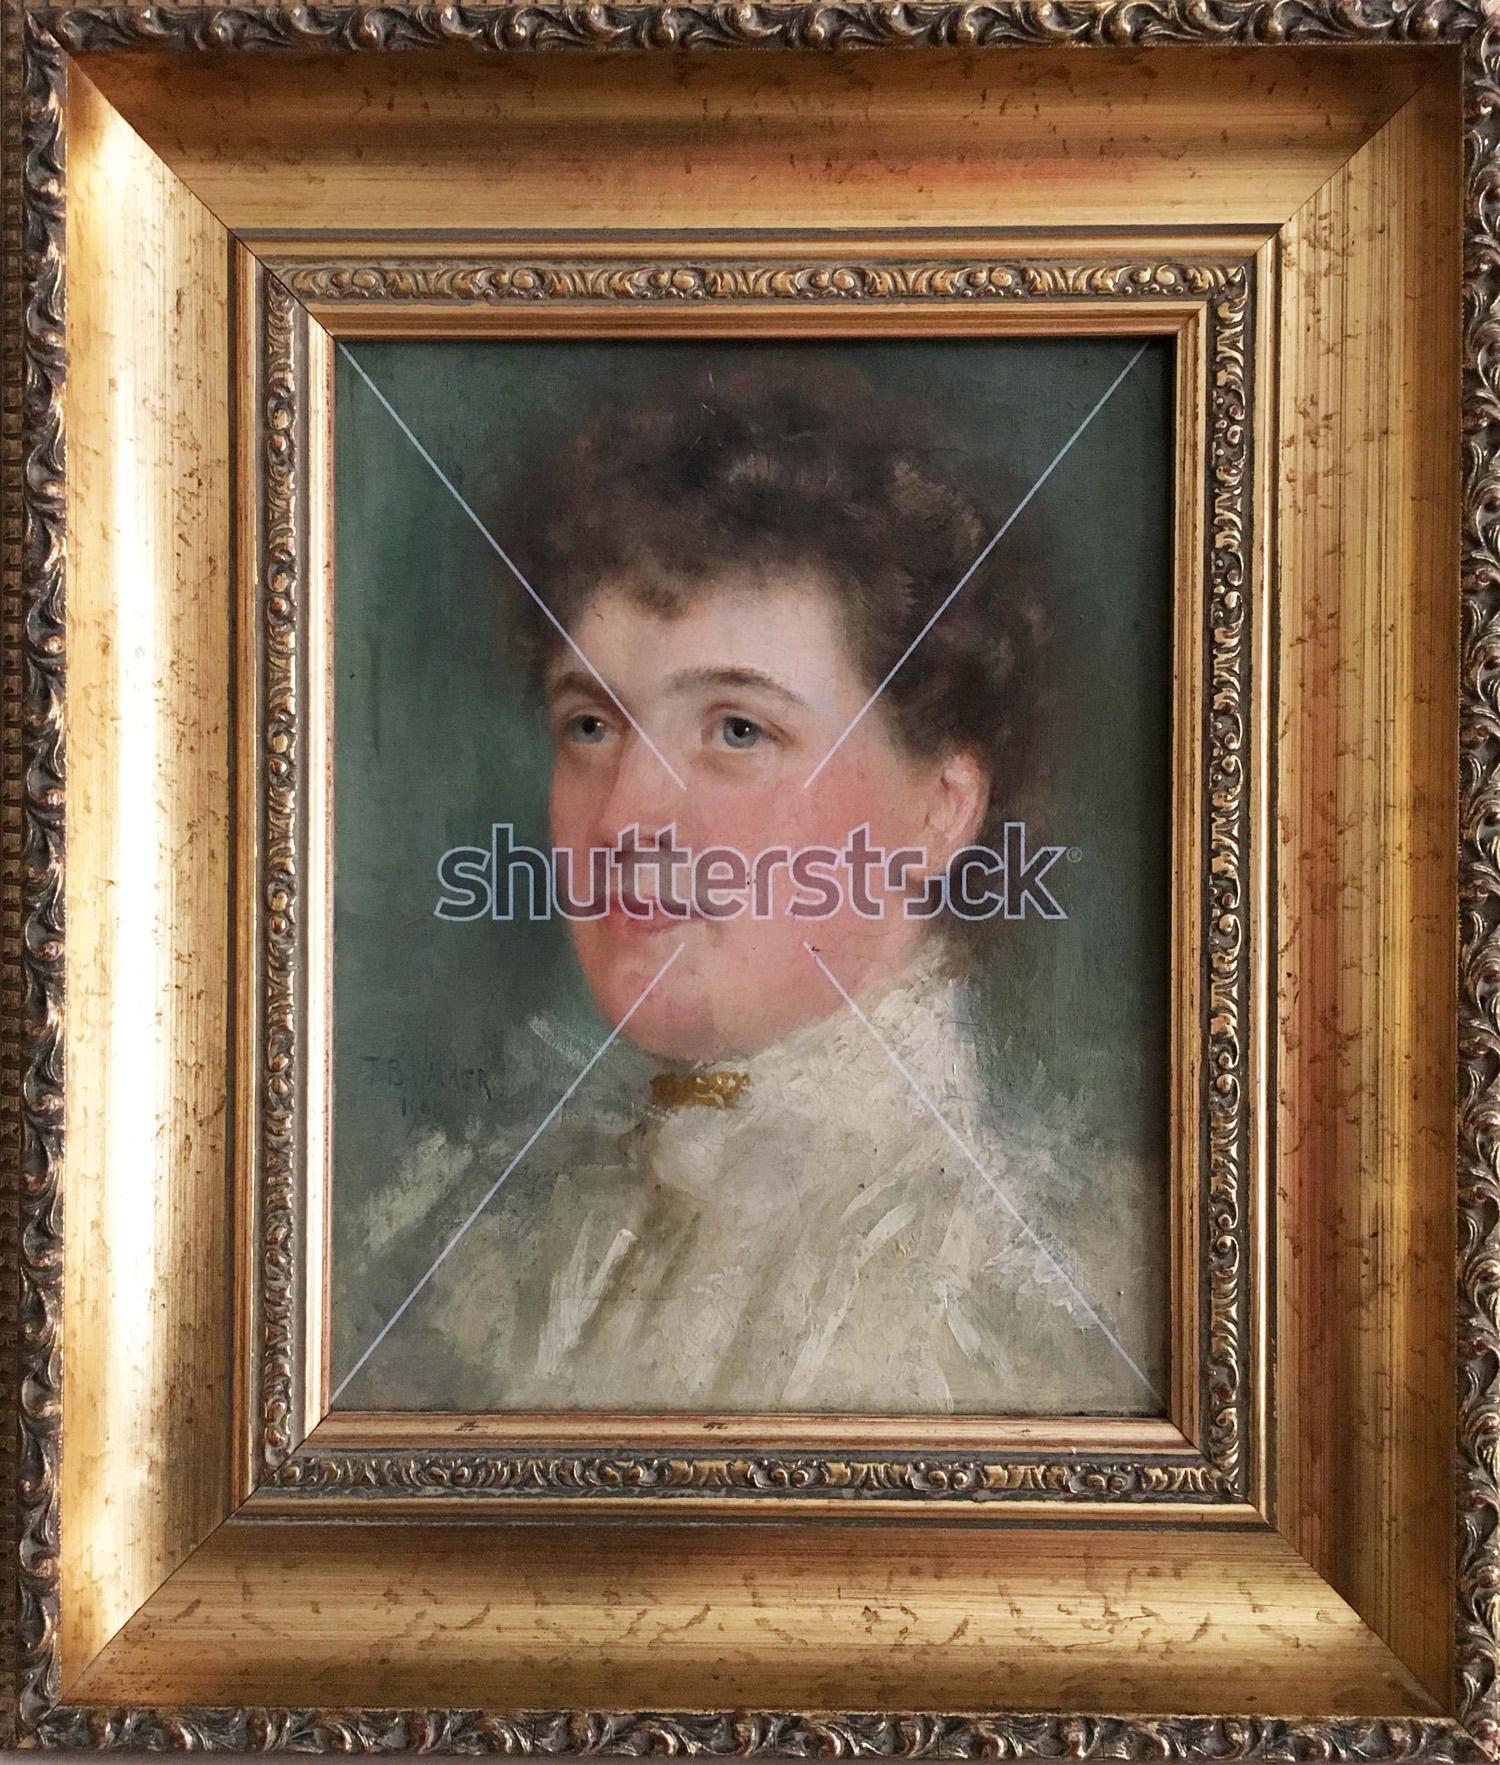 Watermarked Painting #436544659 (Shutterstock meta), 2016 © Paul Stephenson. Originally painted by Thomas Bond Walker, 1901 (Oil on Canvas)